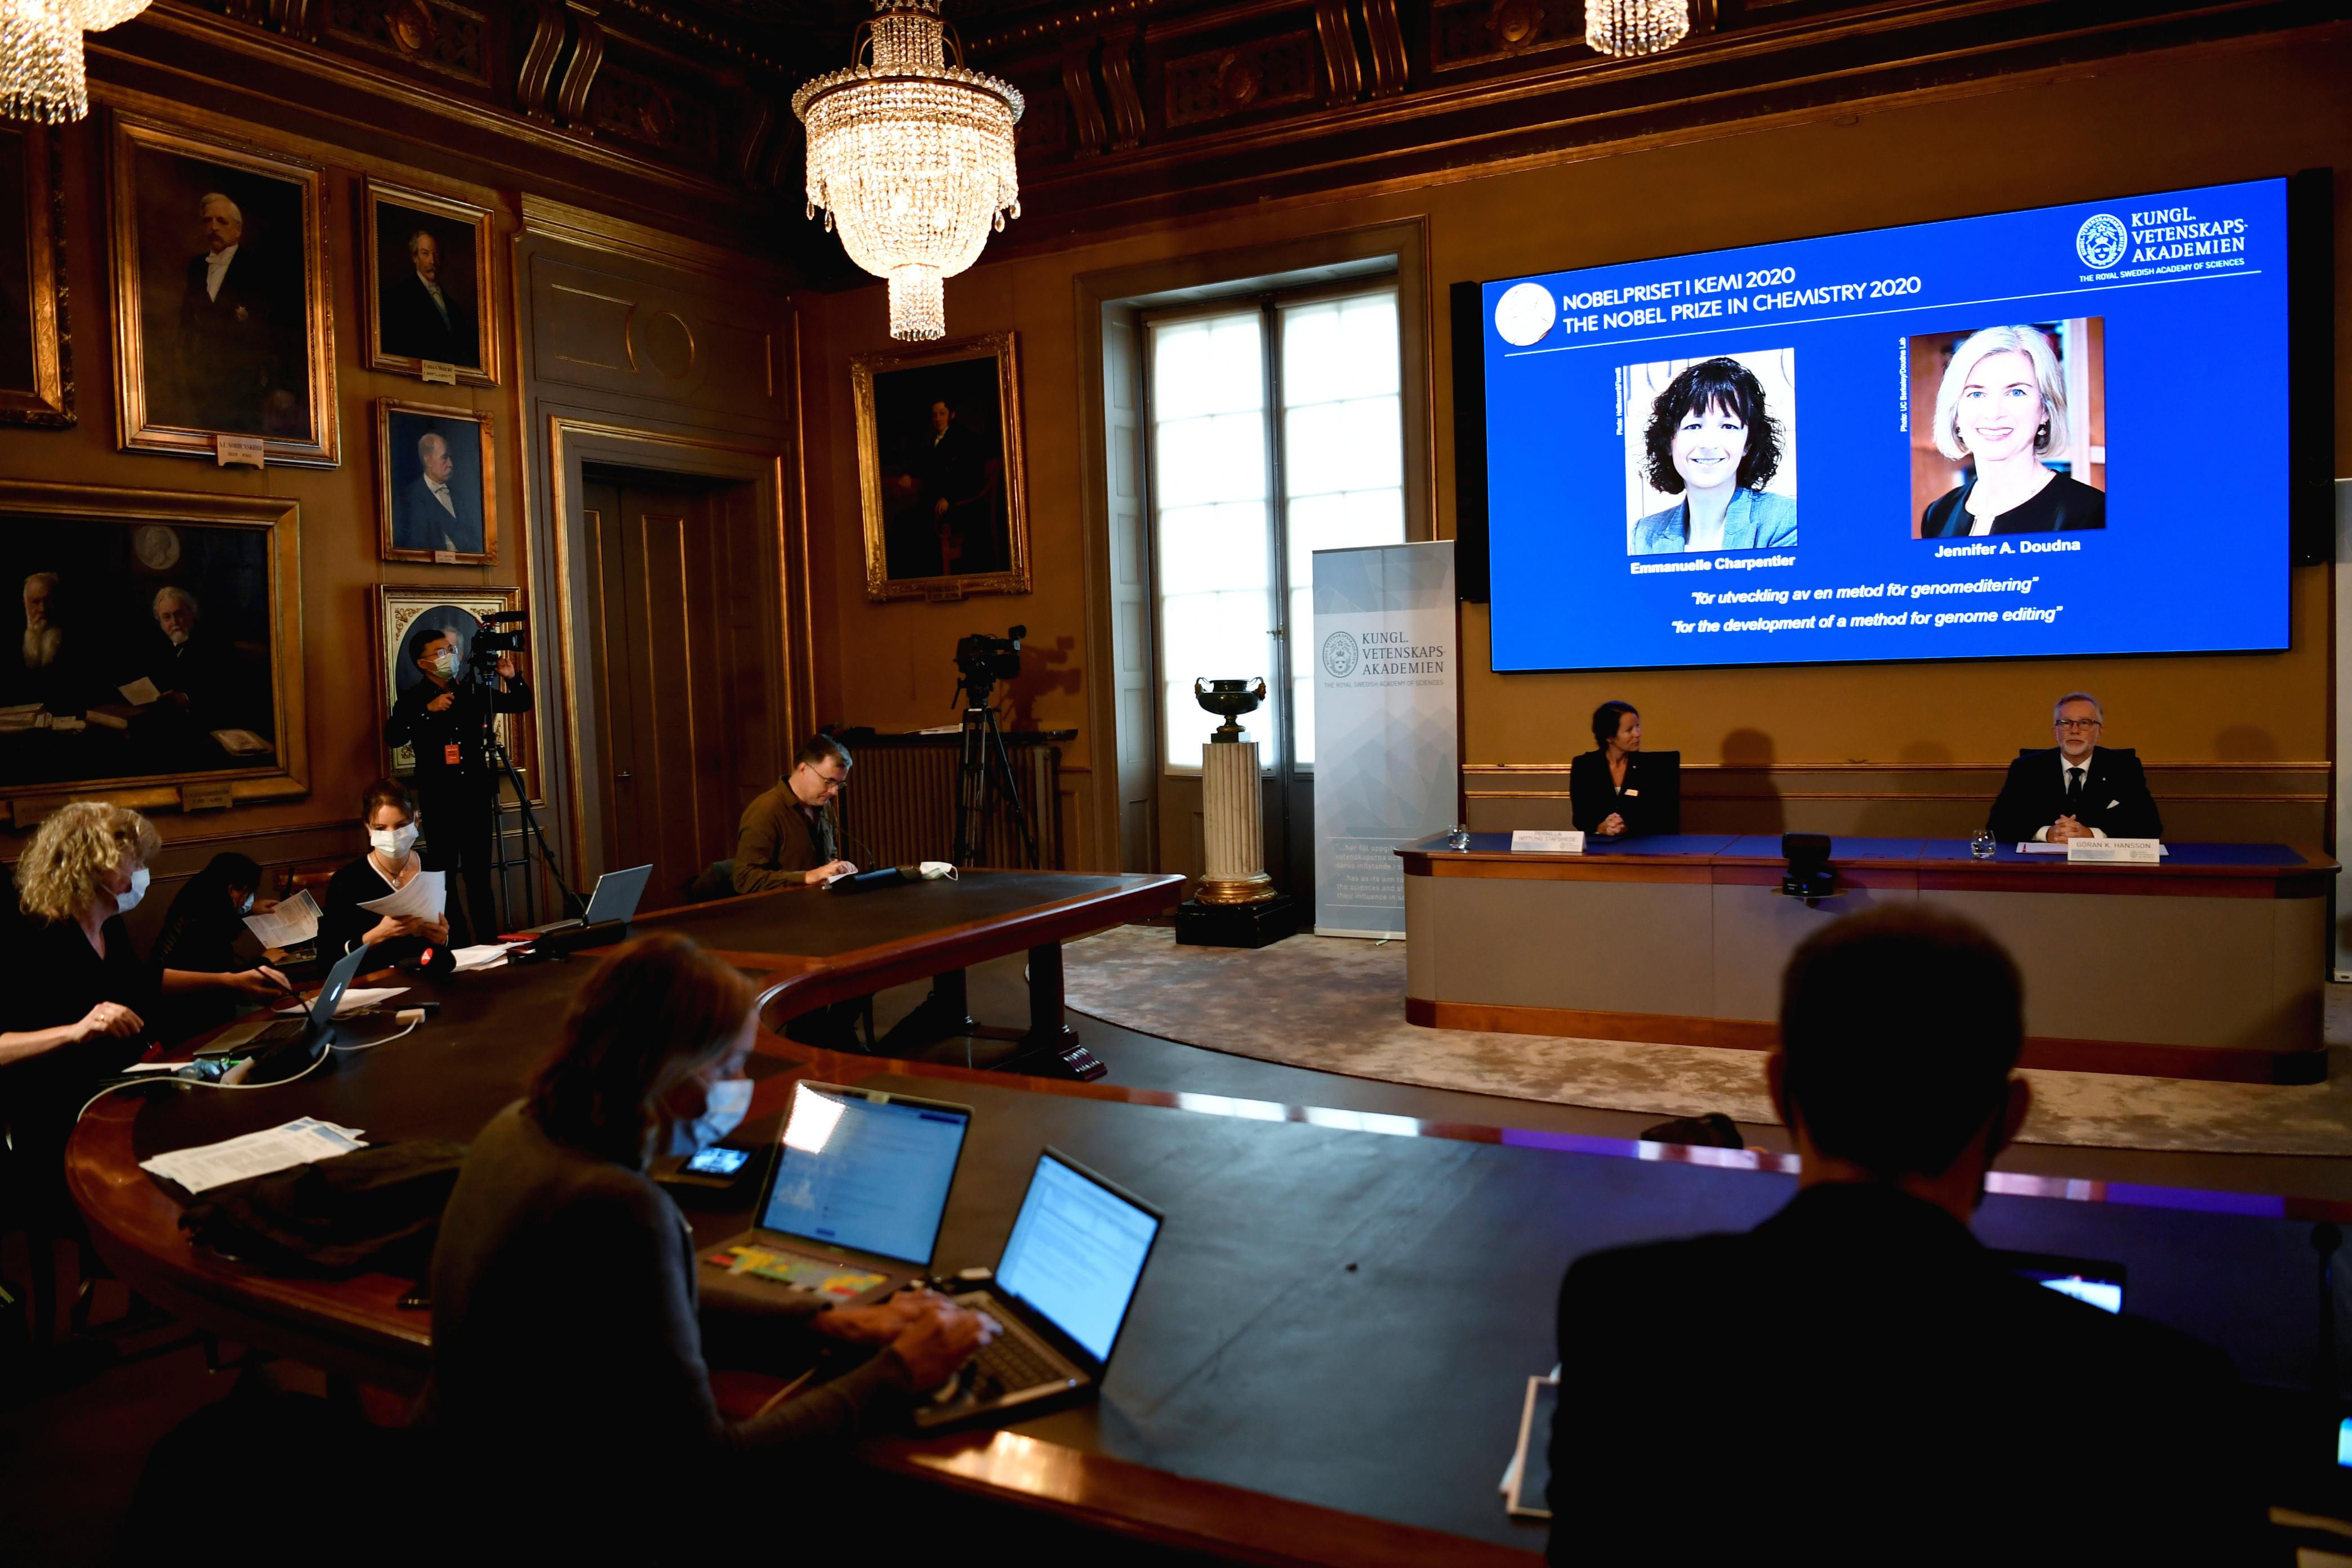 French microbiologist nobel prize winners chemistry genetic scissors Emmanuelle Charpentier Jennifer Doudna